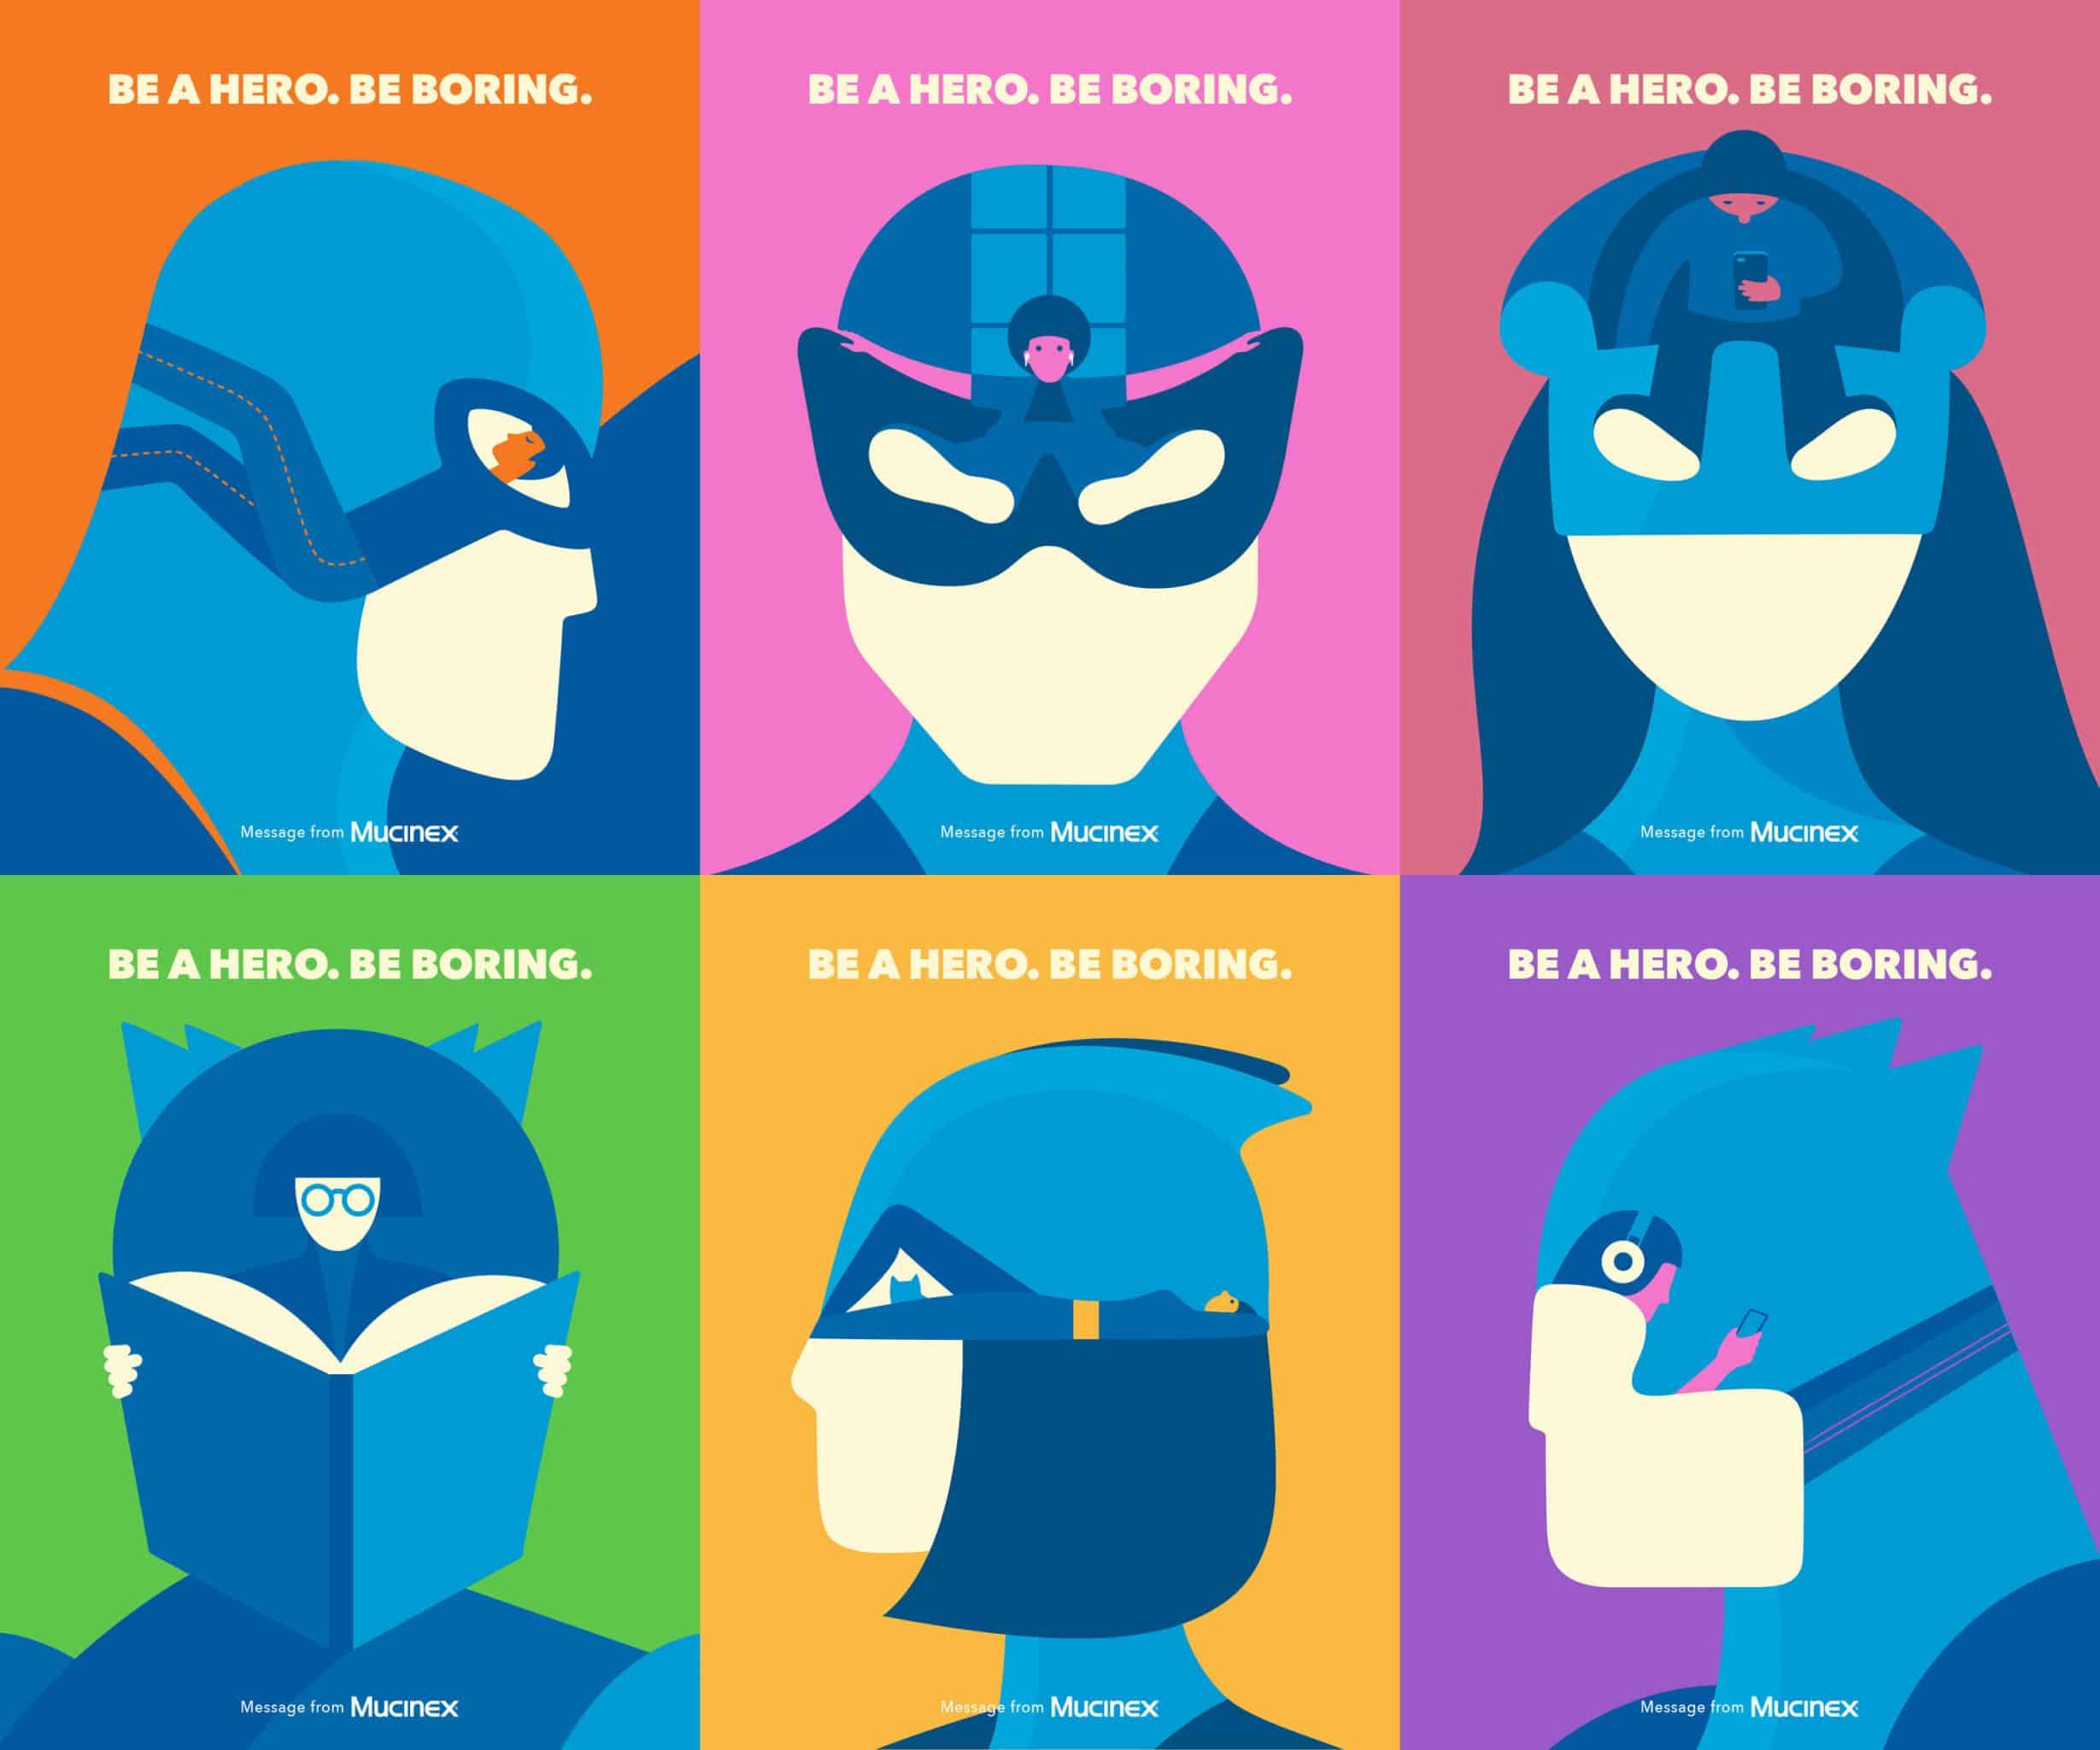 Stuff We Love #7 - Be Boring. Be A Hero